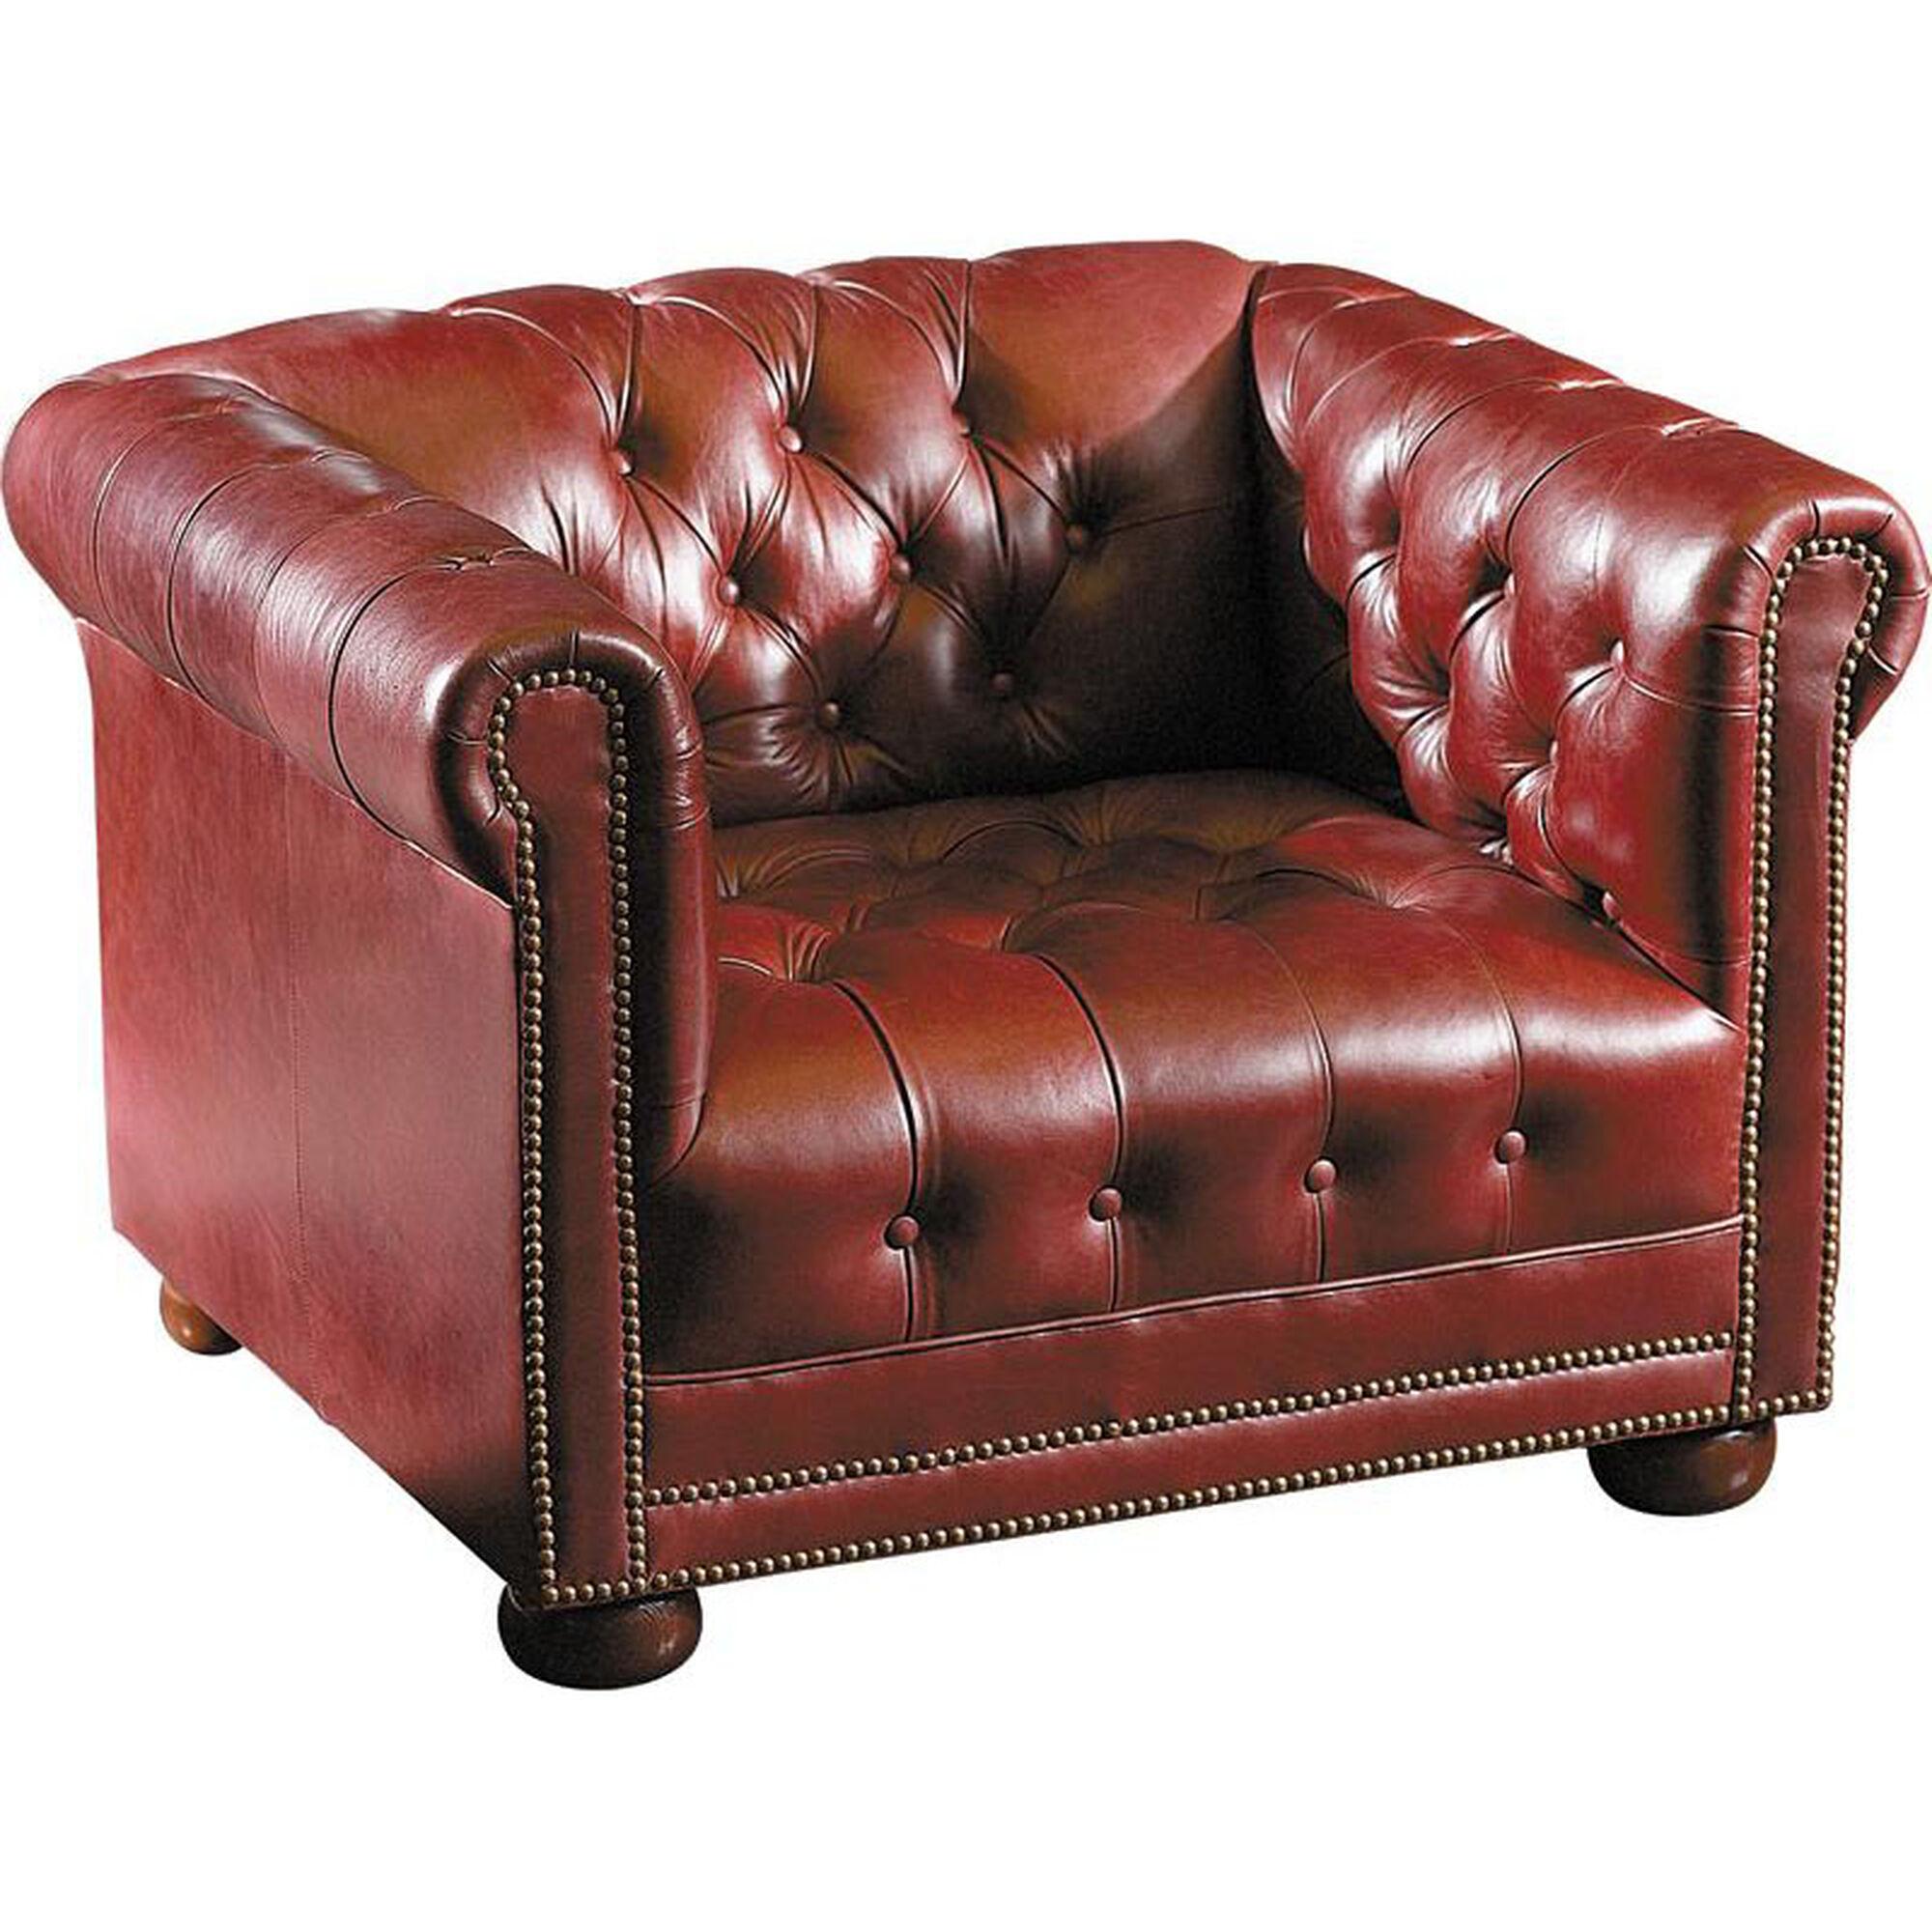 High Point Furniture Industries 4301 Hpf 4301